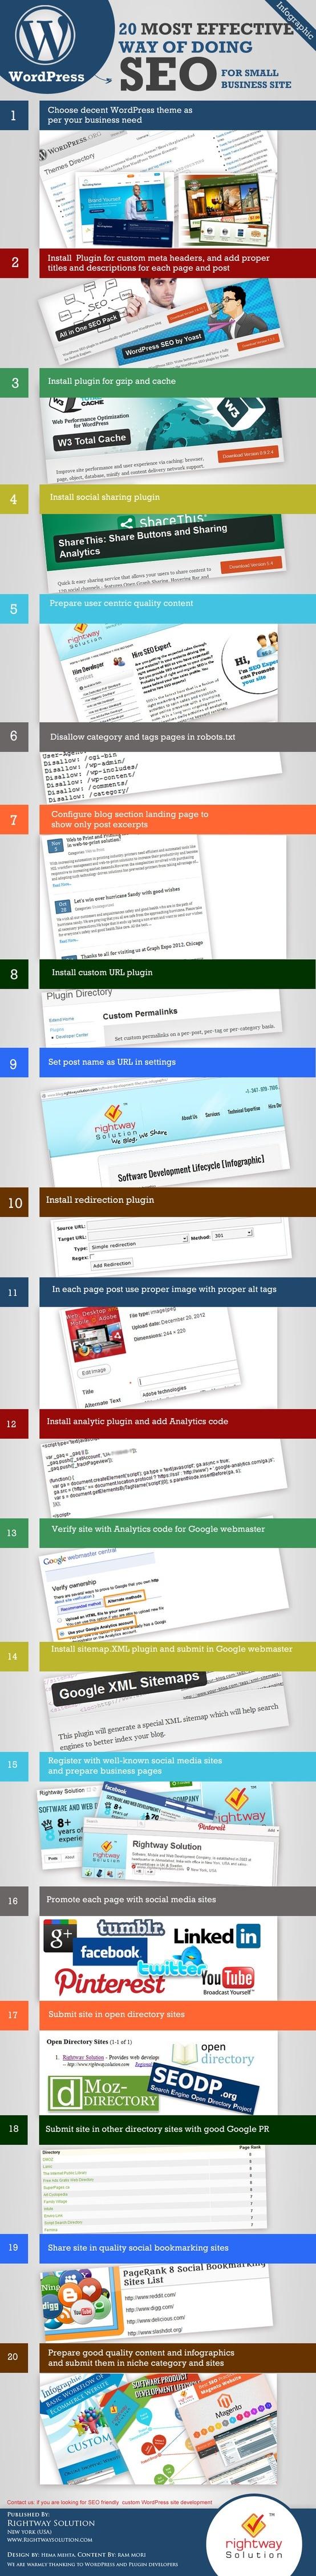 WordPress SEO: HOW-TO